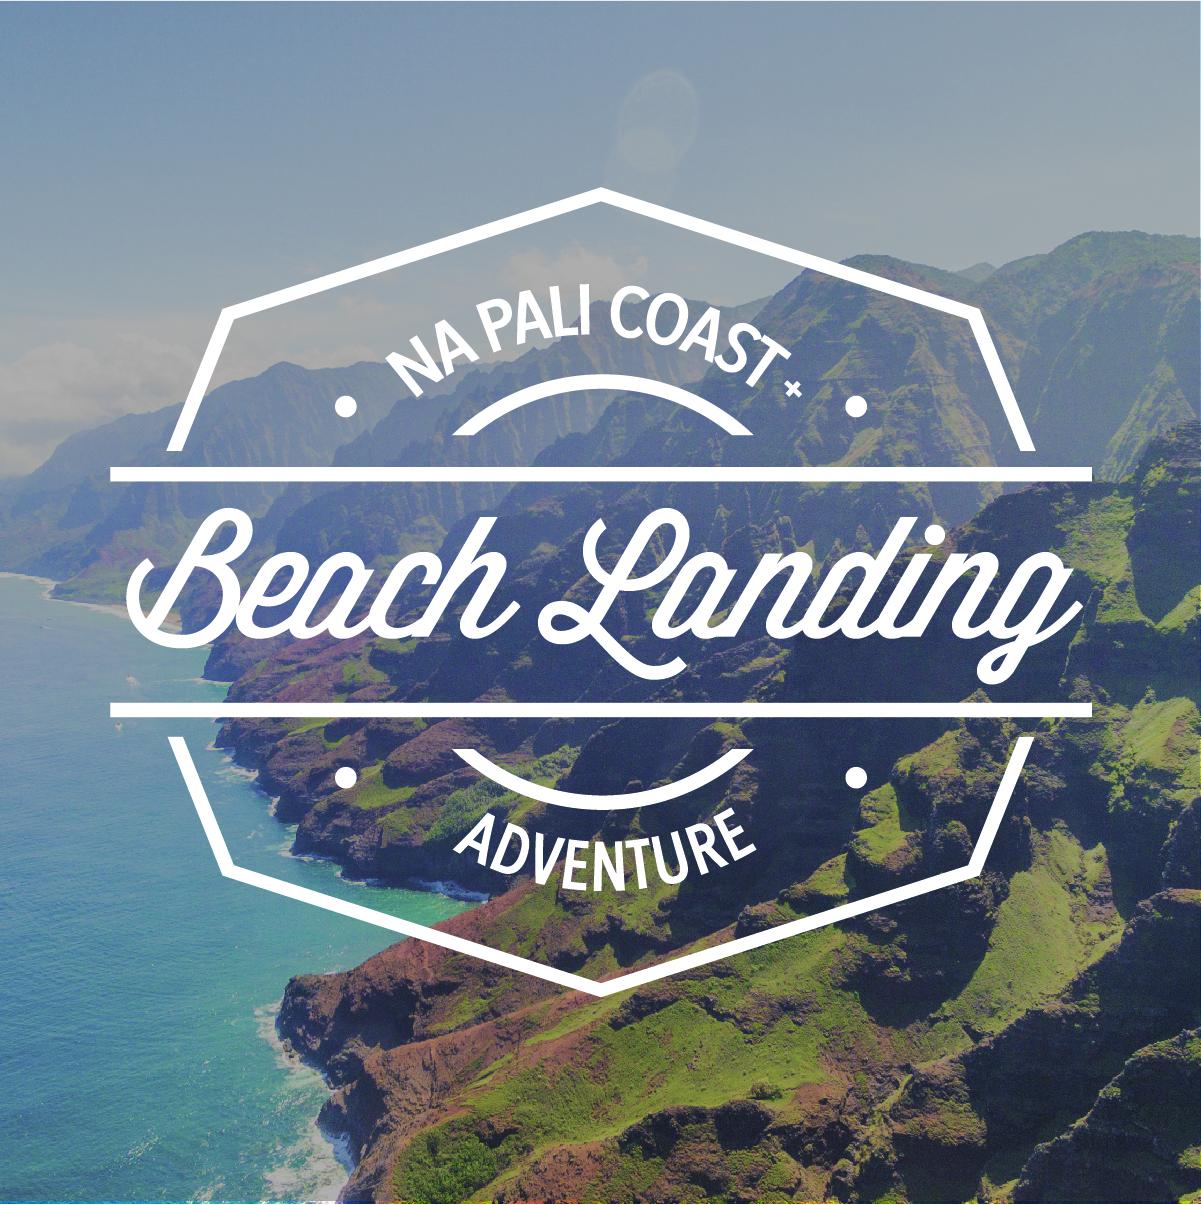 BeachLanding.jpg